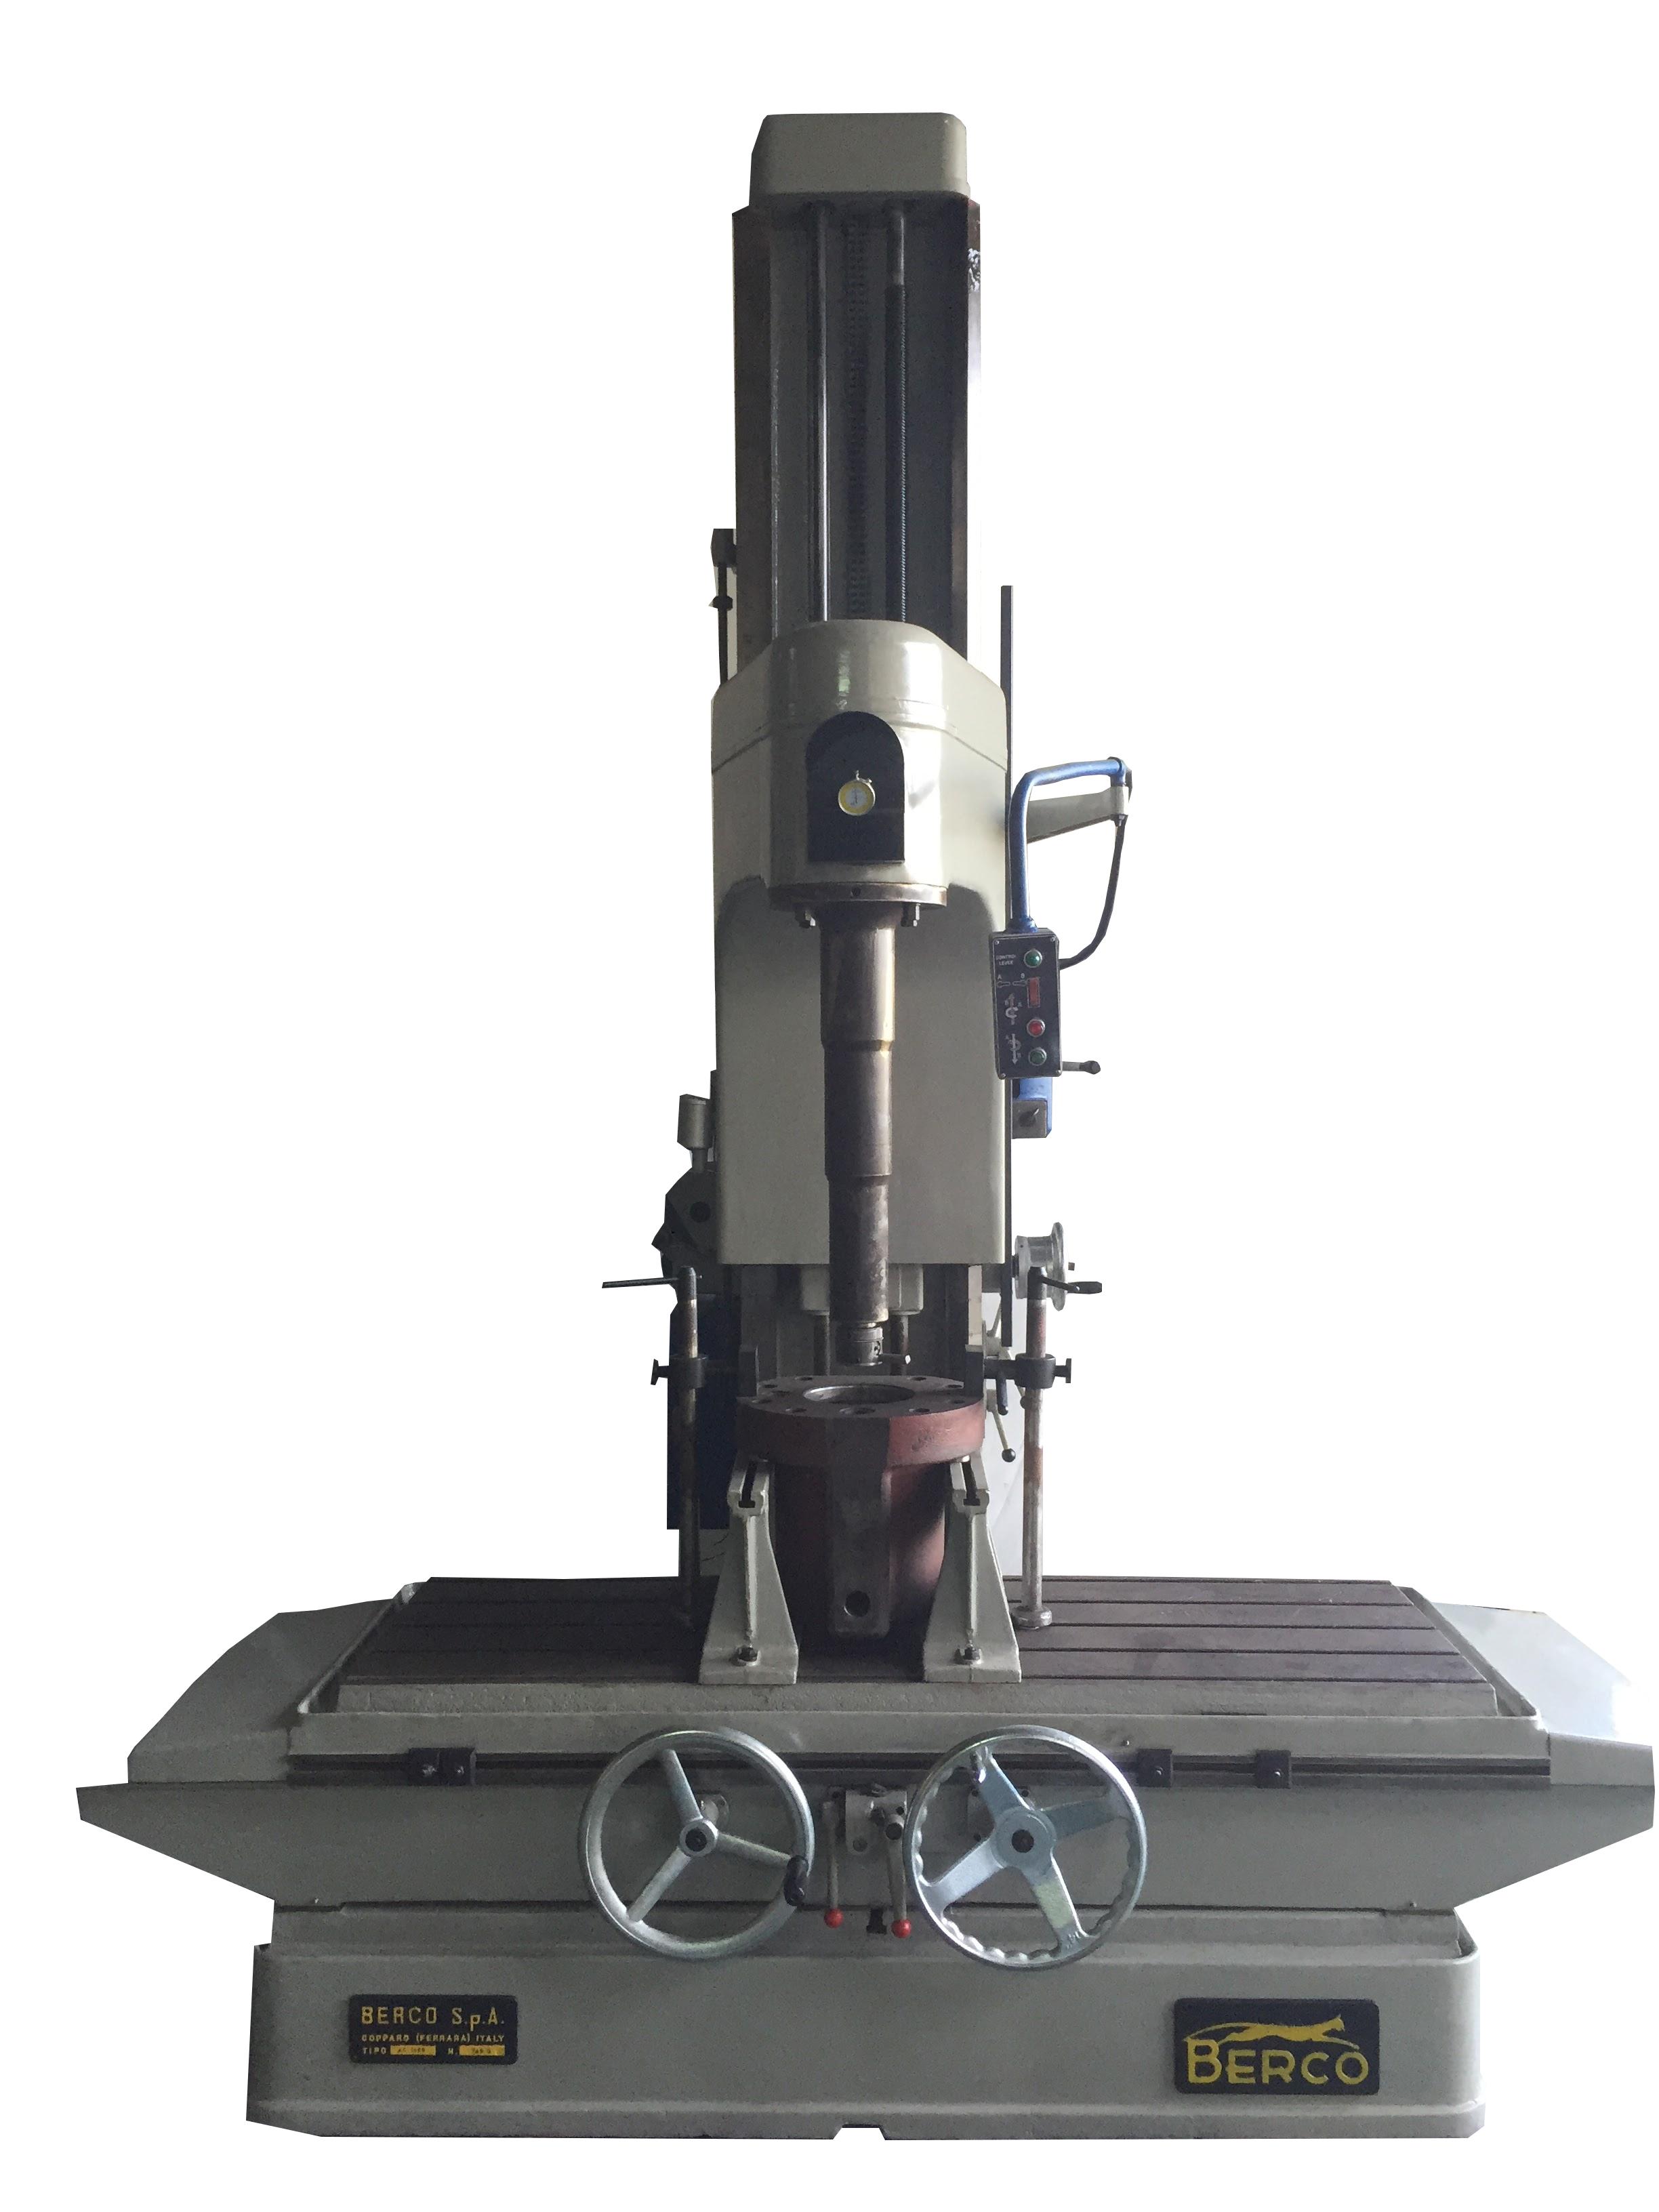 Berco 1400-S Used Cylinder Boring Machine